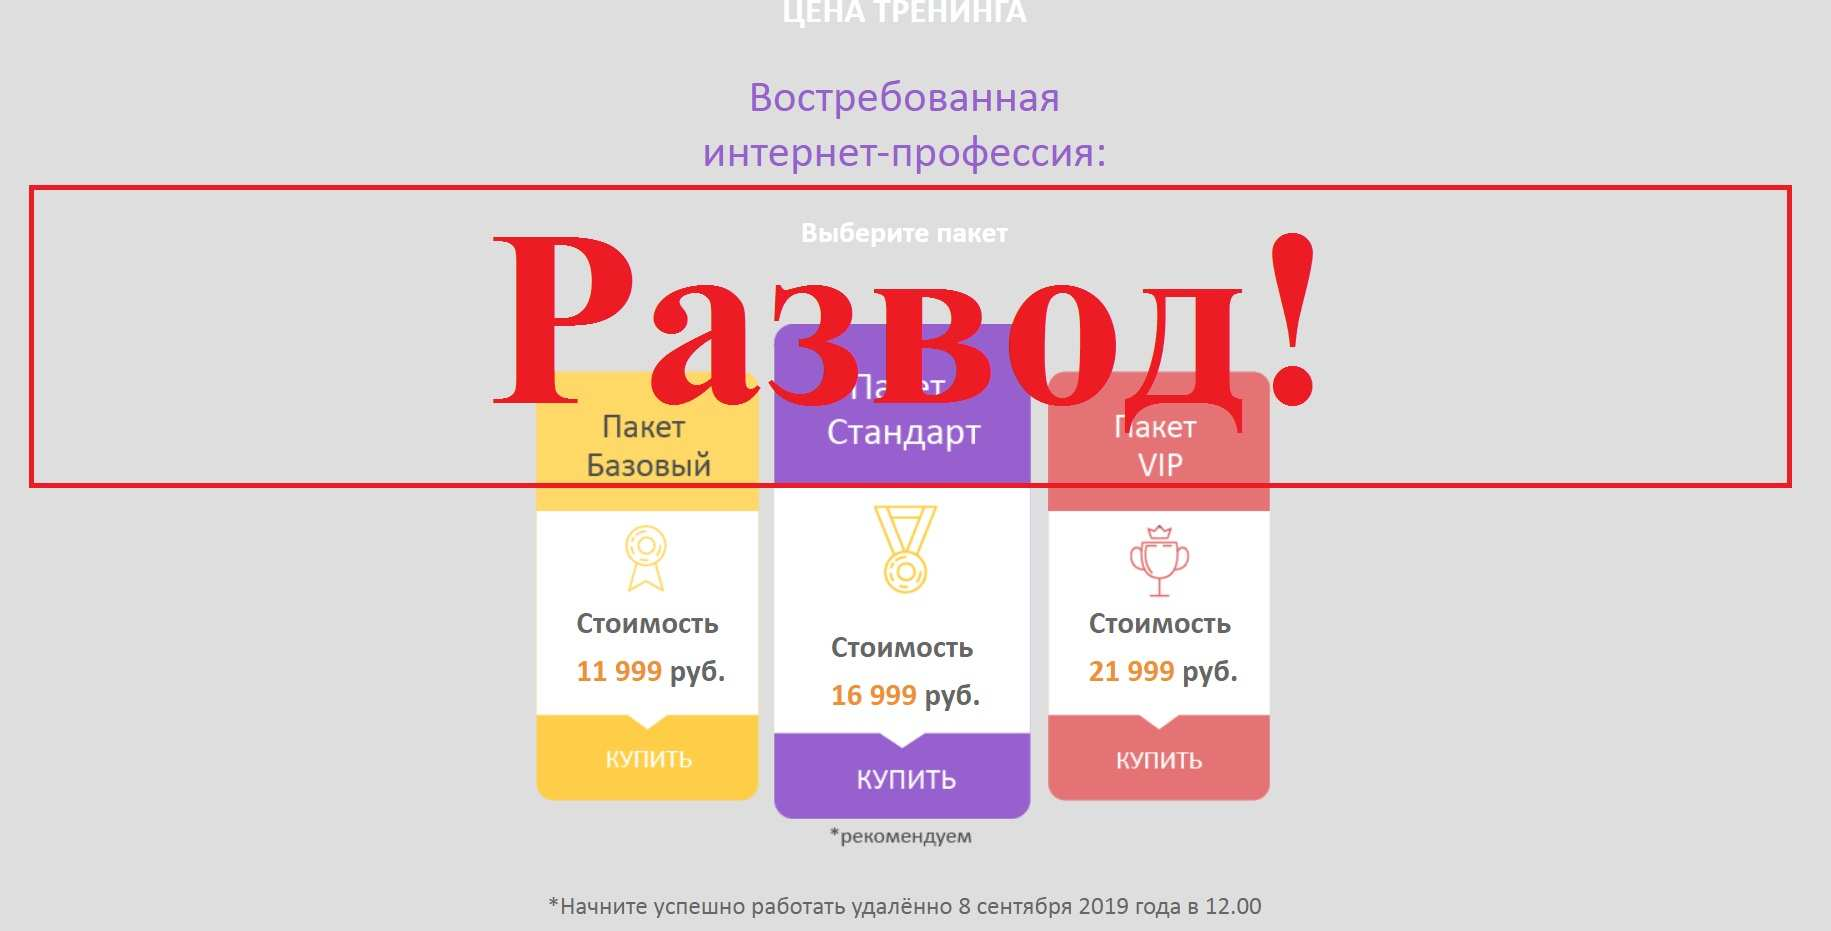 Sekiro.ru – отзывы об университете удаленной работы